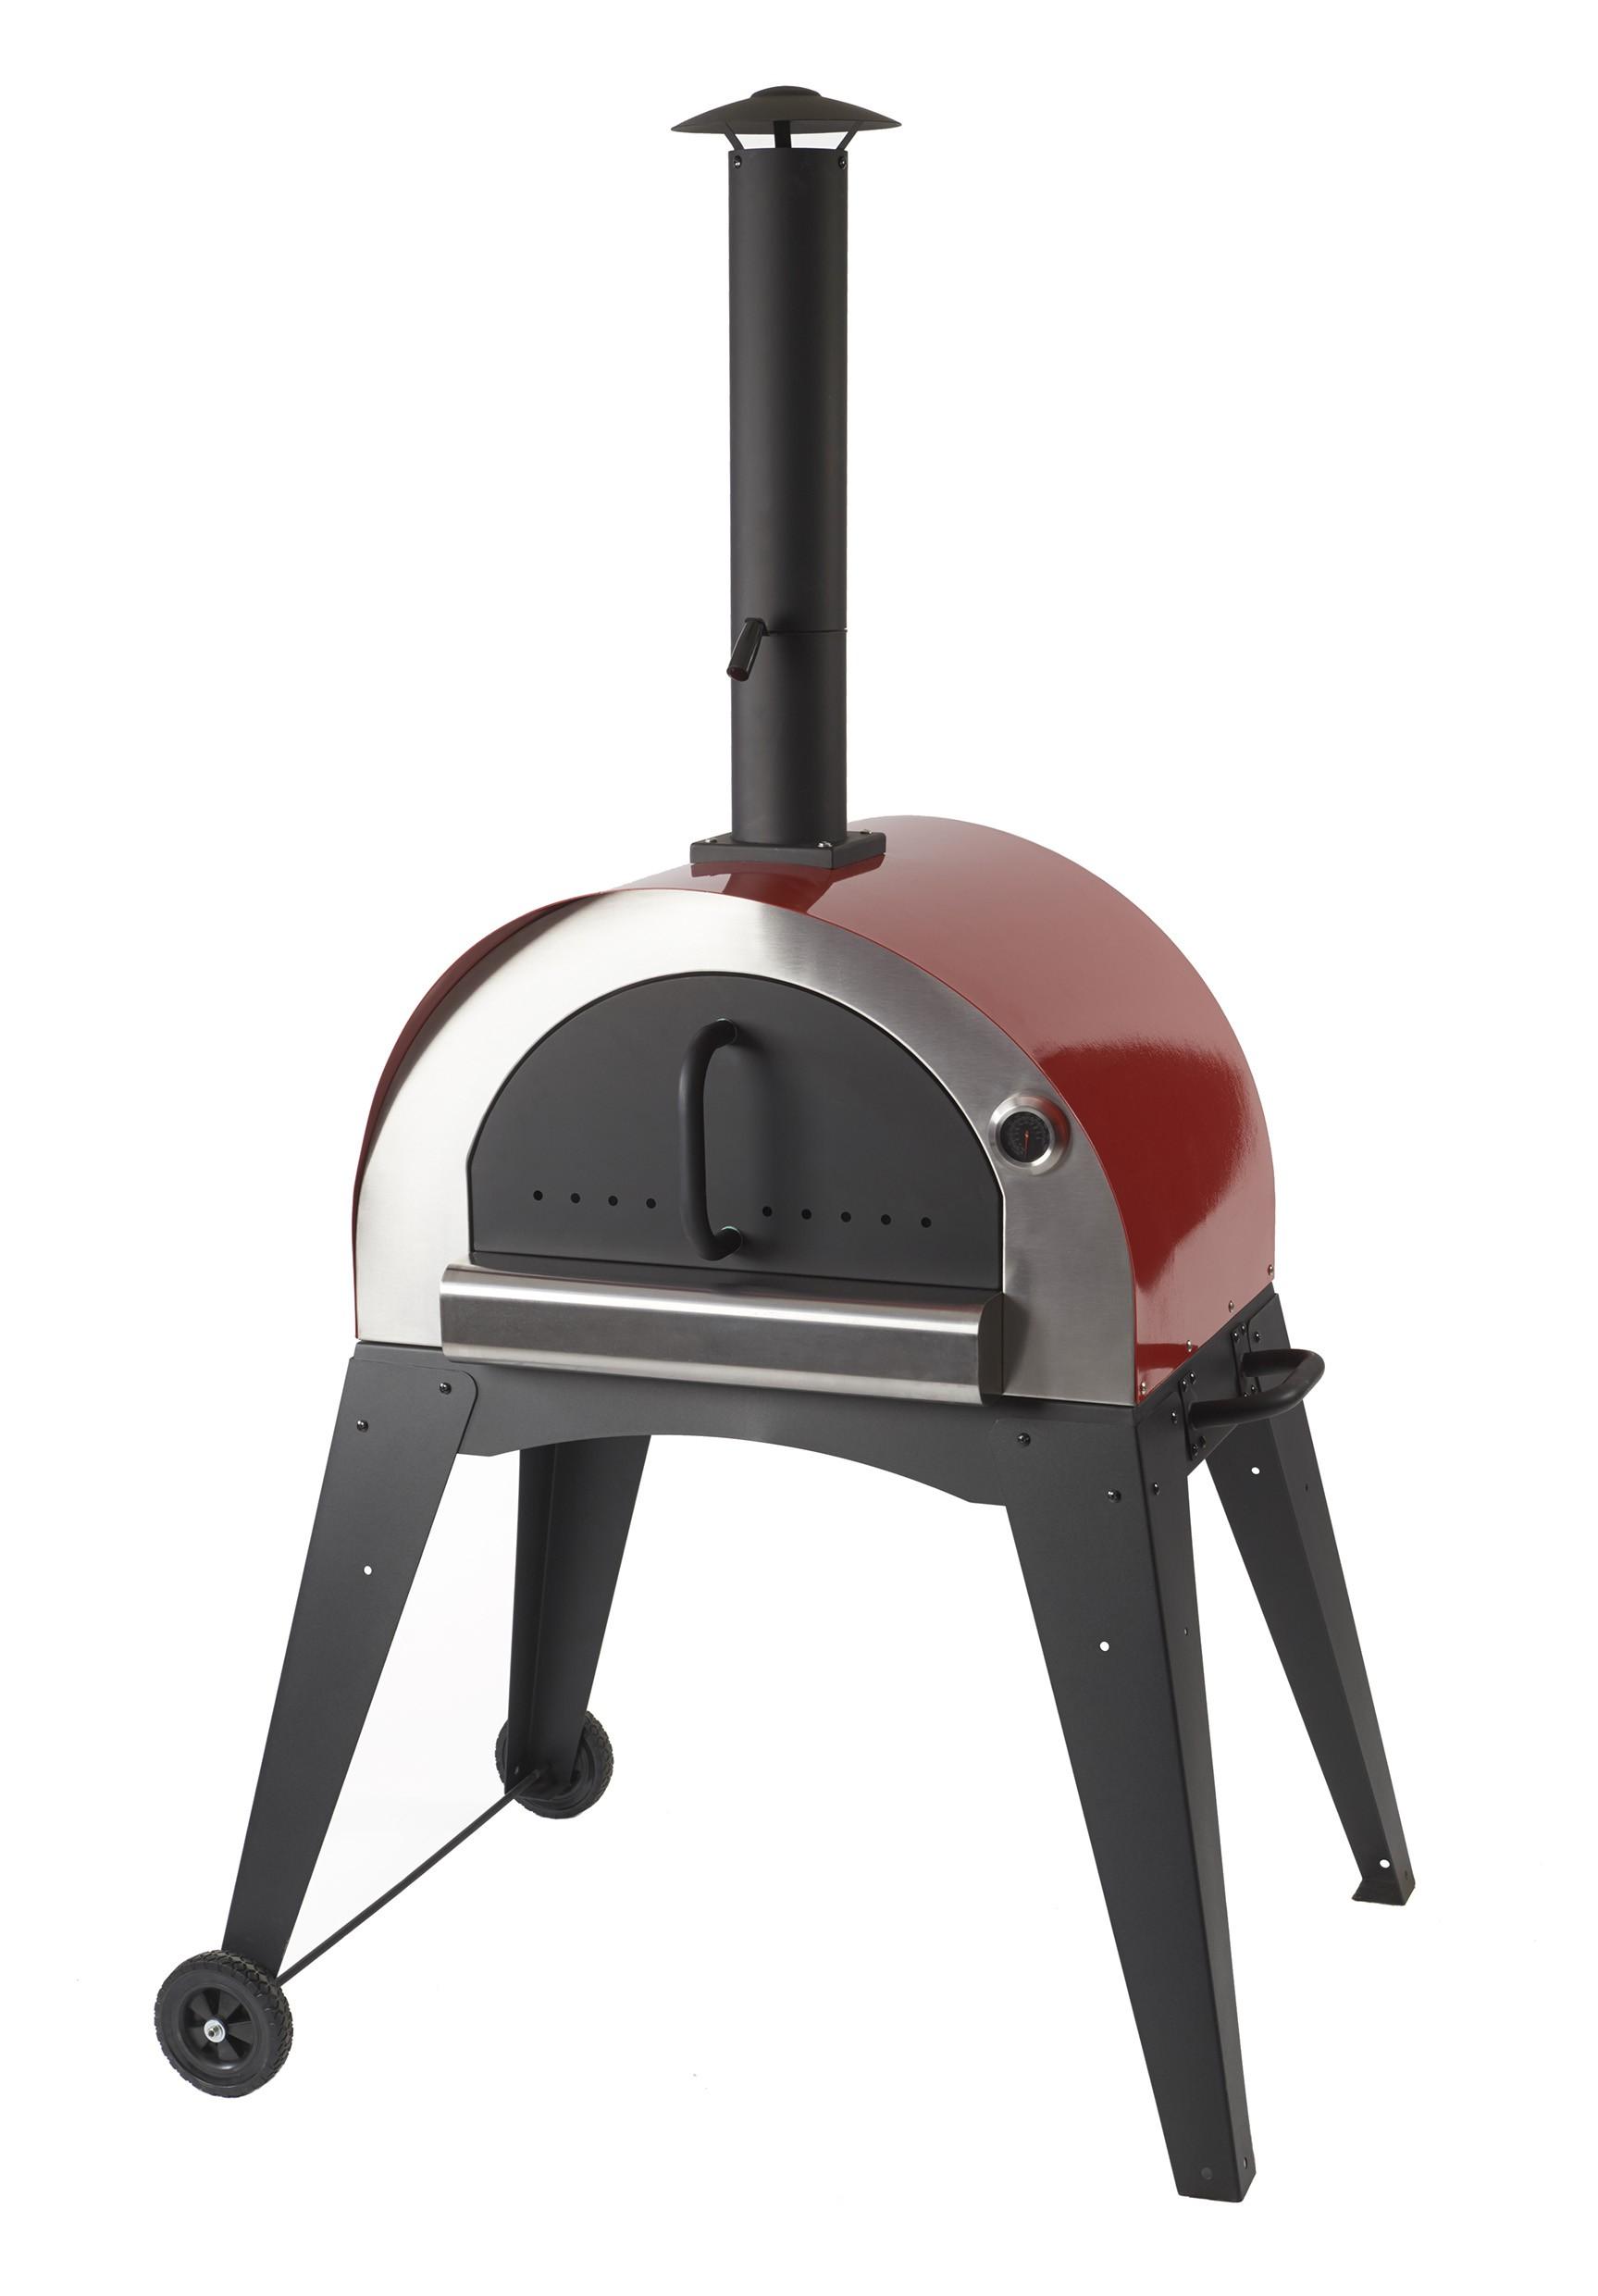 Pizzaofen / Brotbackofen / Flammkuchenofen / Holzbackofen Ciao R Bild 1